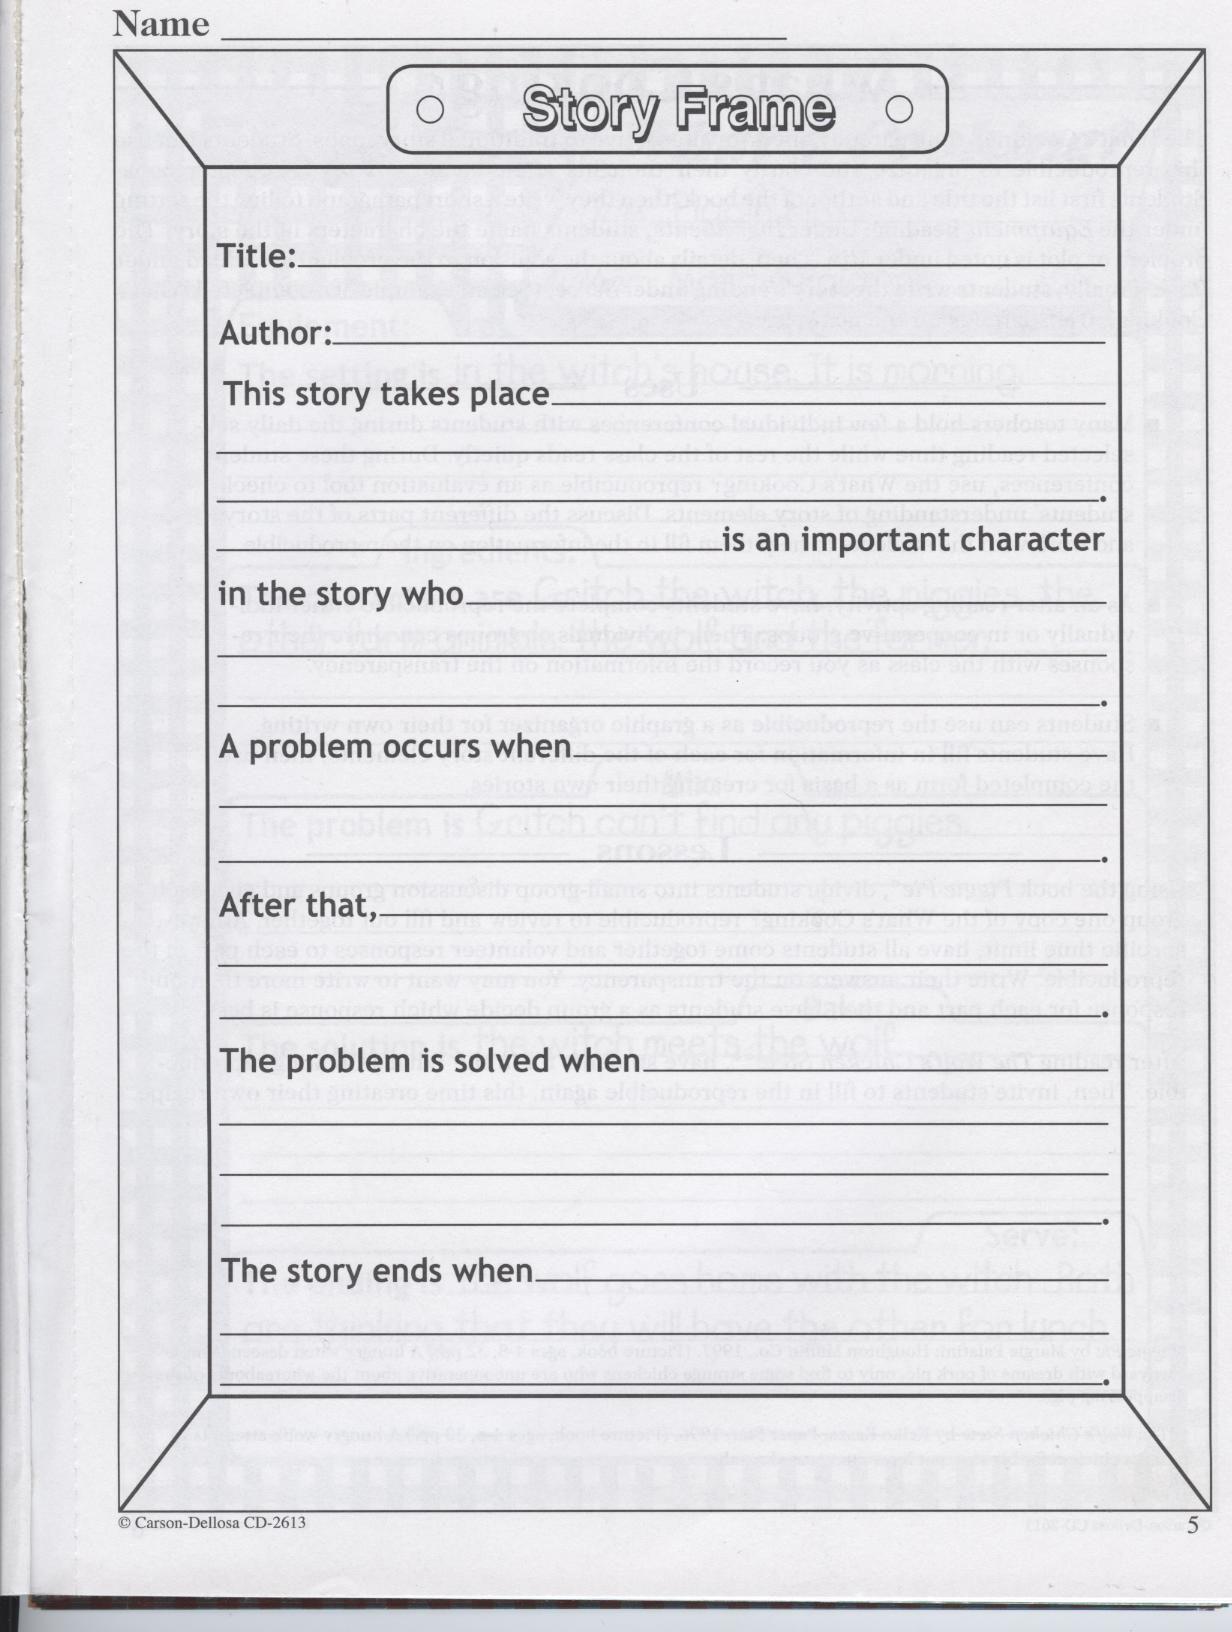 Book Report Stories